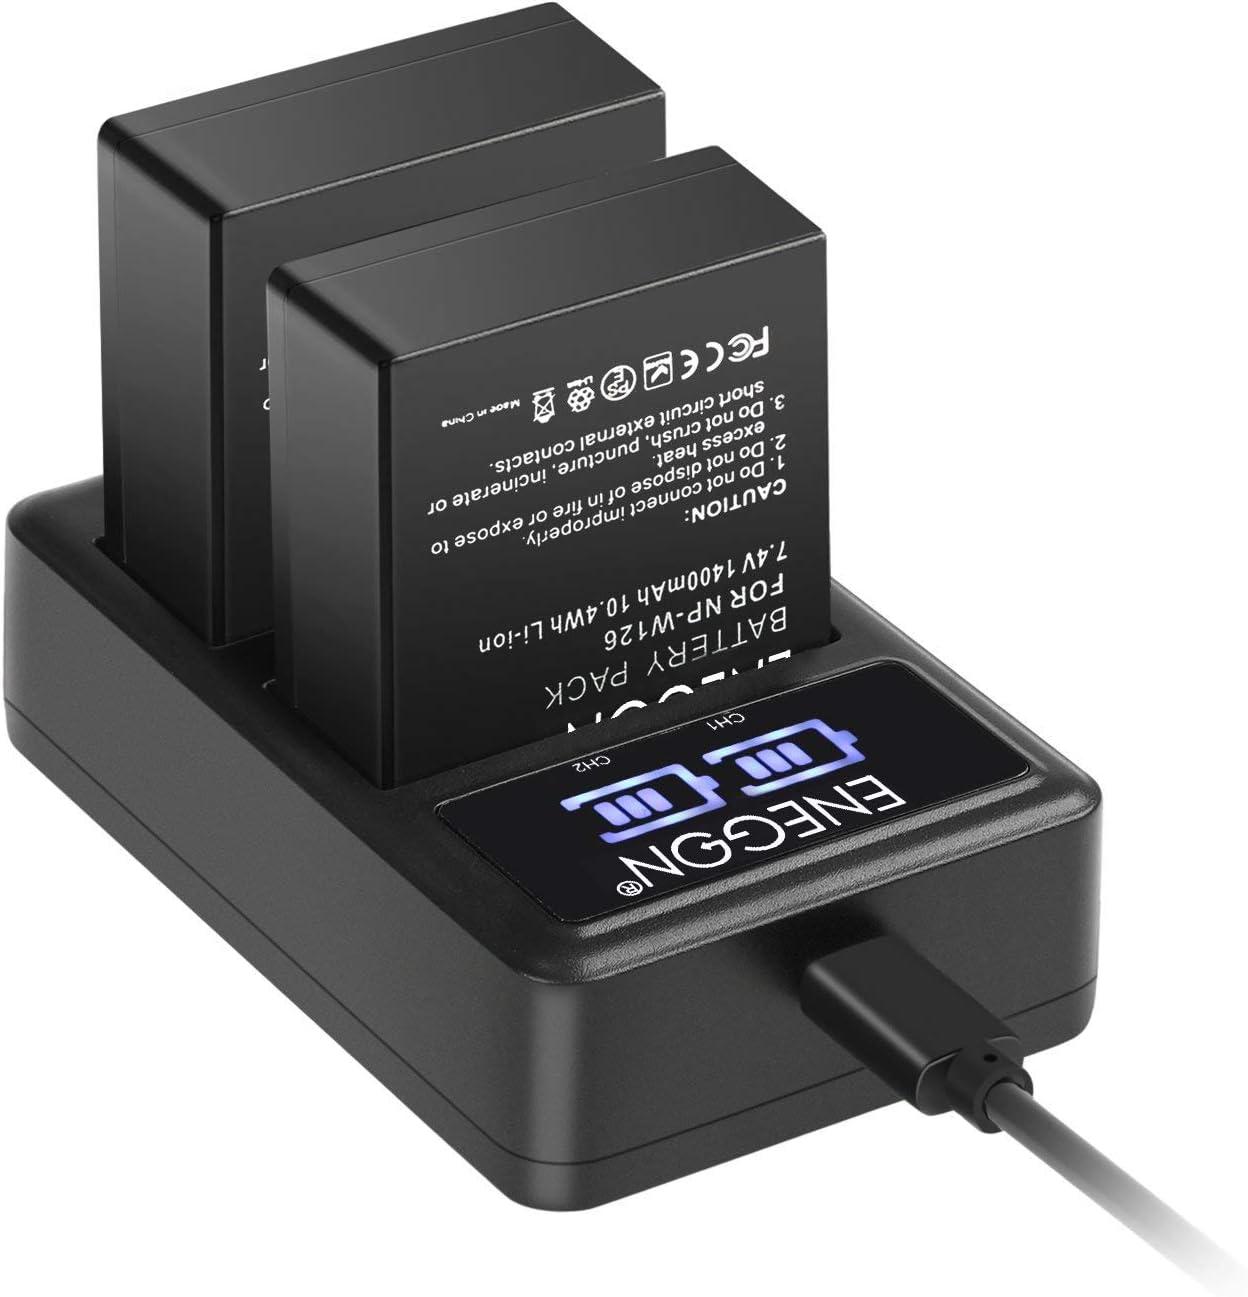 BC-W126 Cargador de batería para NP-W126 Fujifilm Finepix HS30EXR HS33EXR HS50EXR